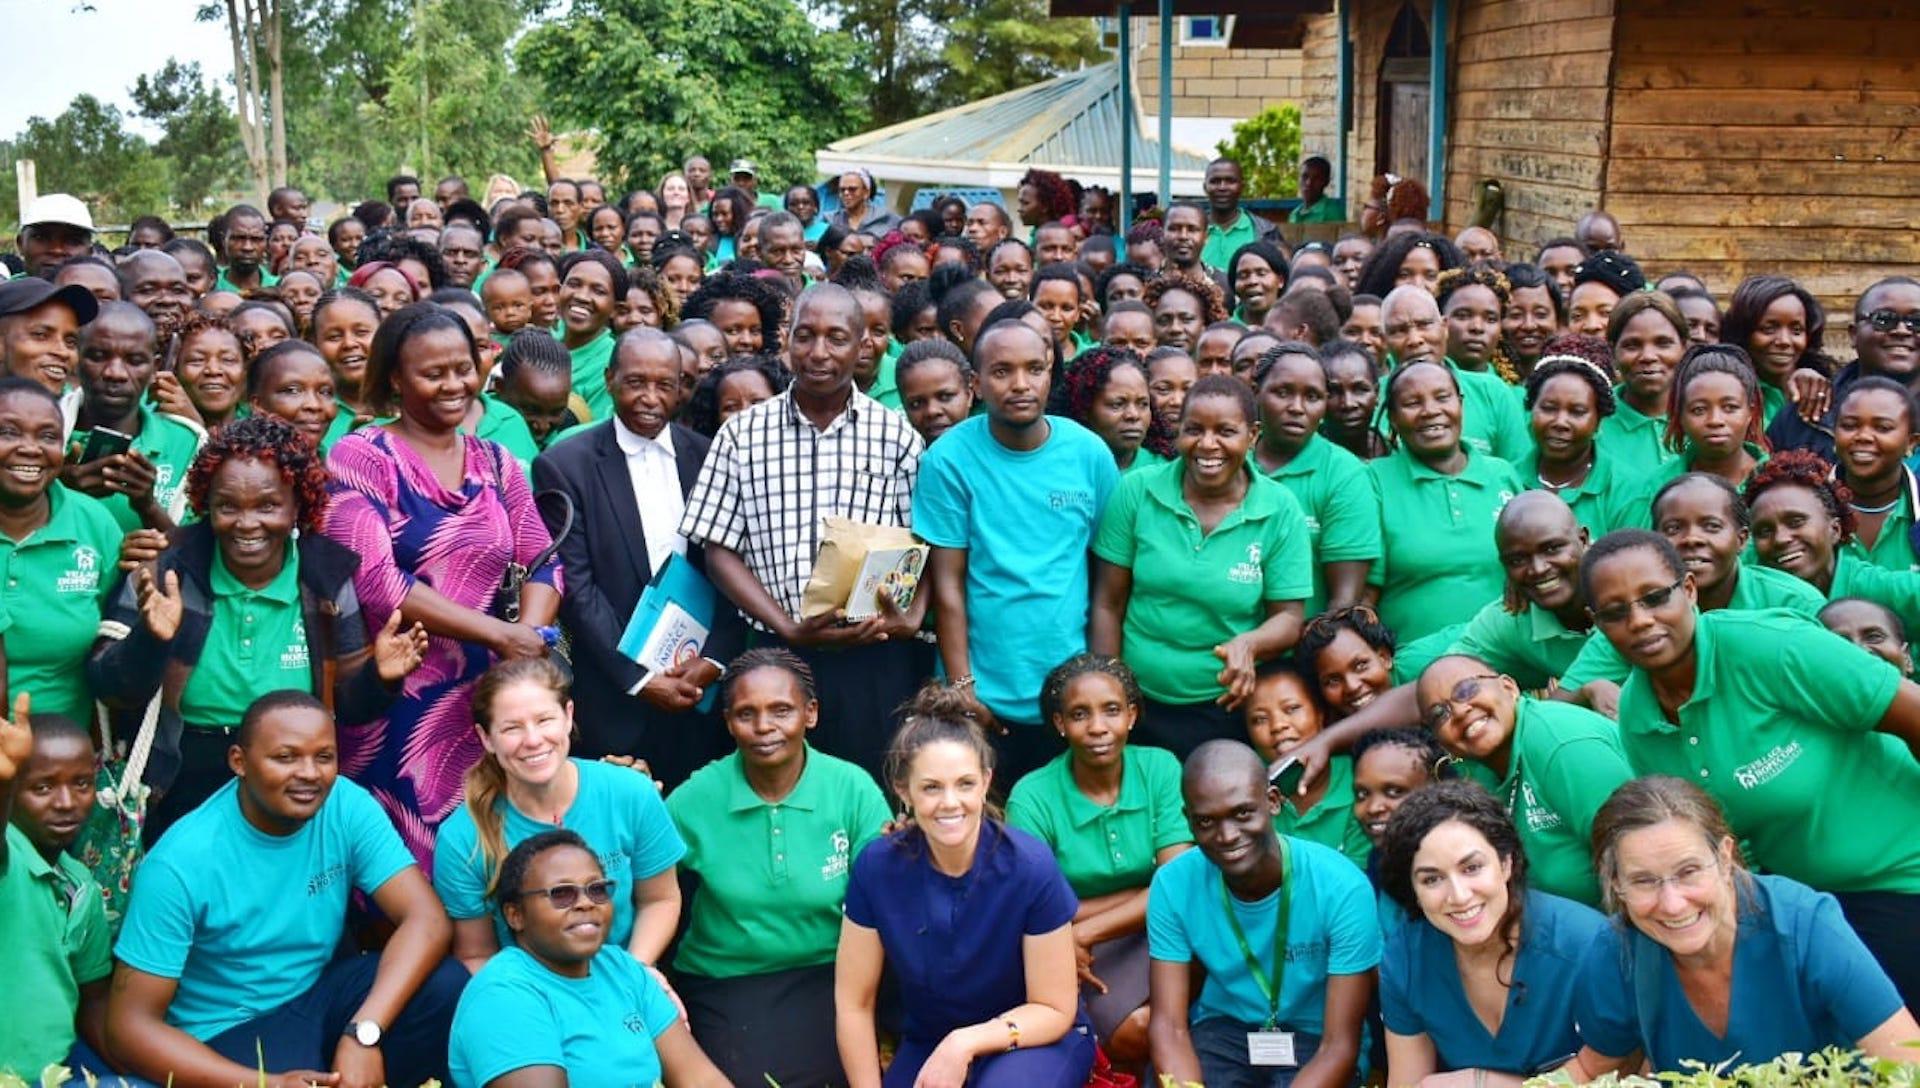 Our Team at MedTreks Kenya